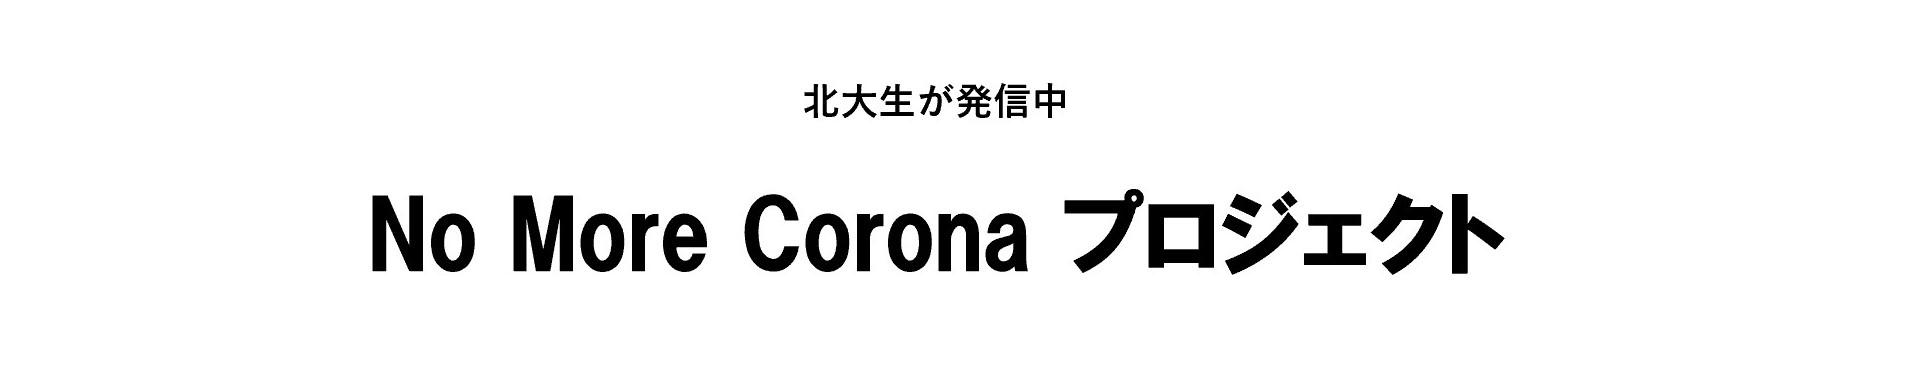 No More Corona プロジェクト